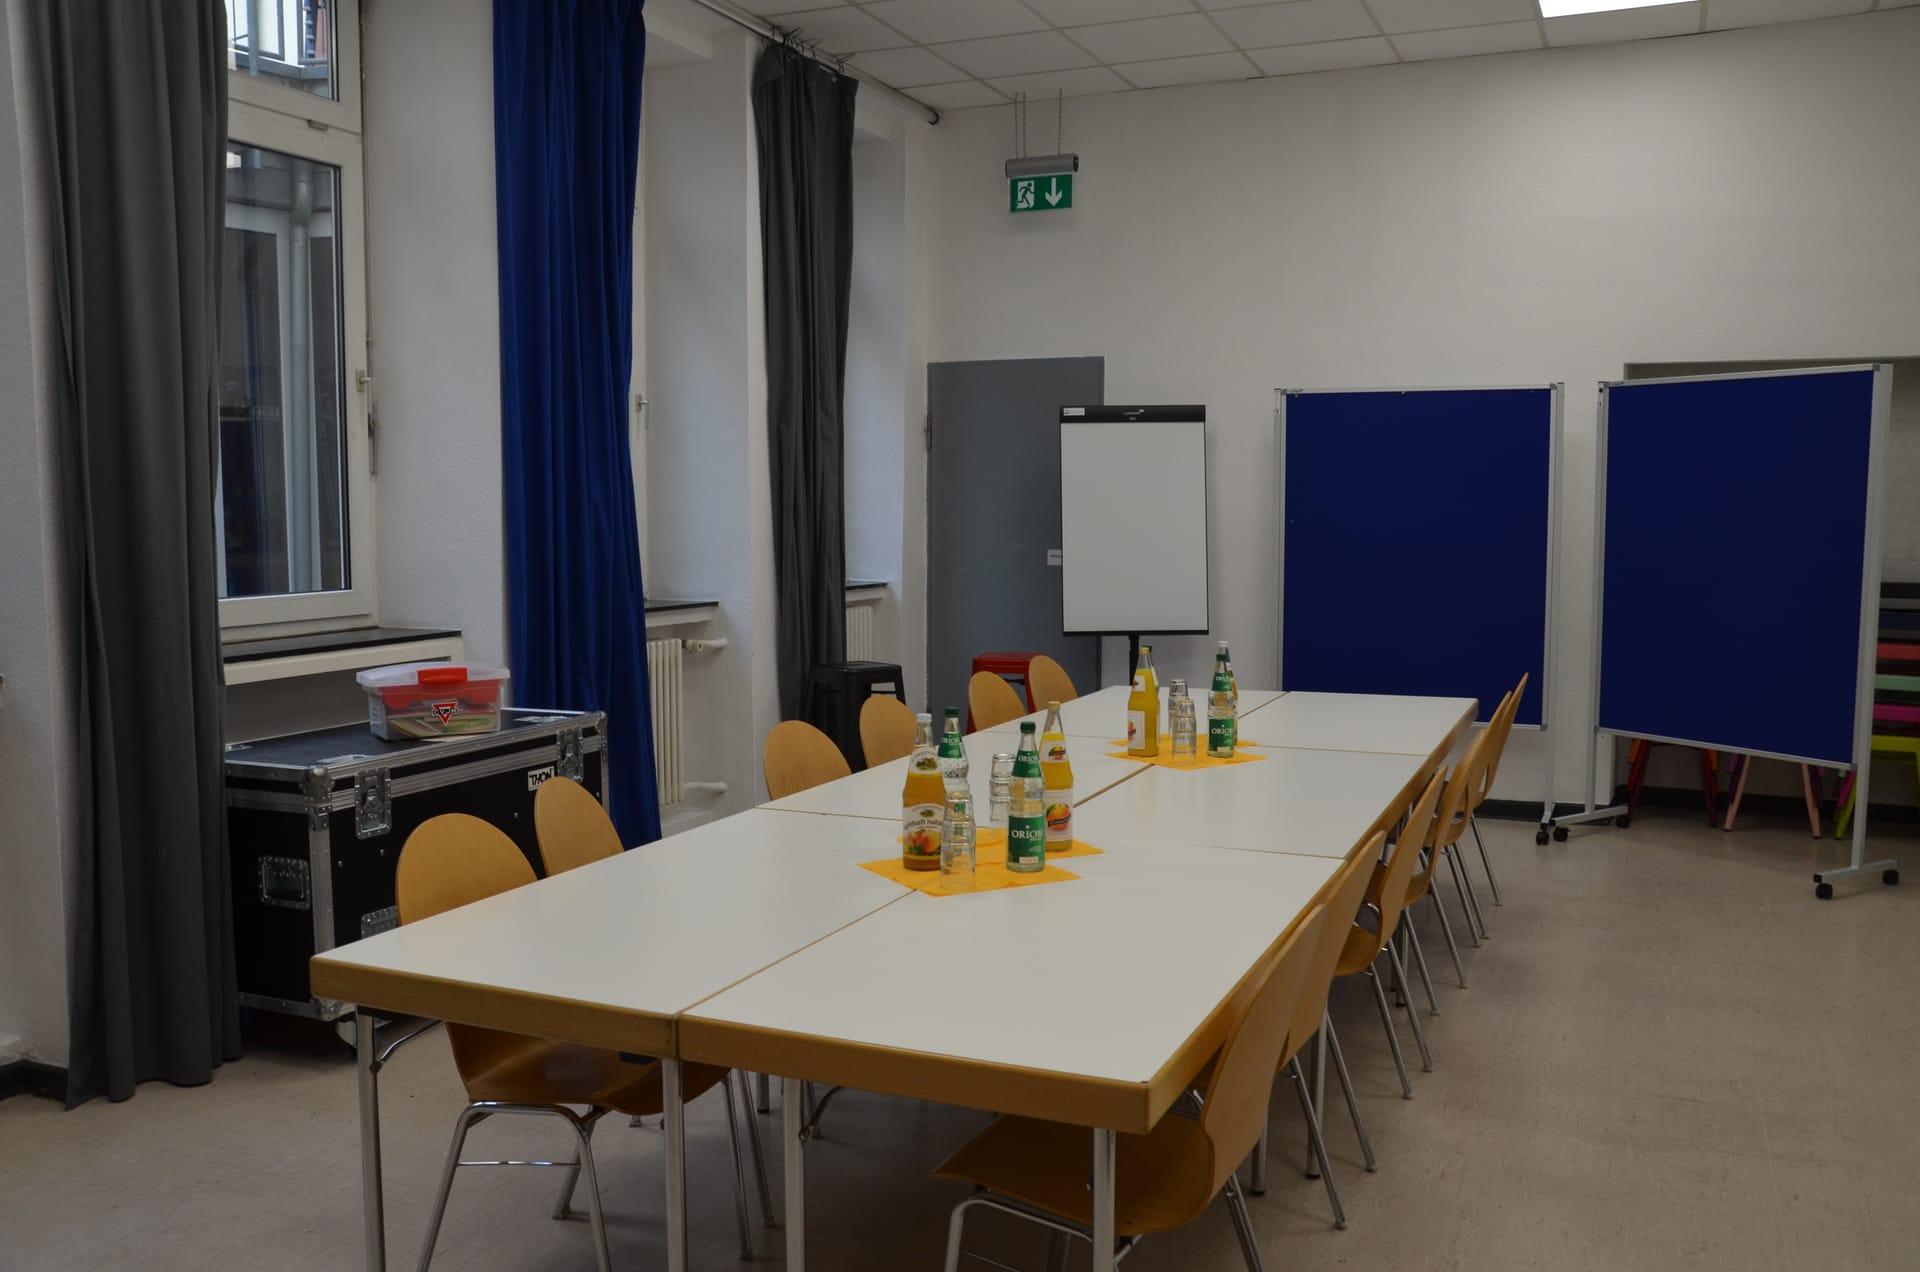 CVJM-Mannheim - Meetingraum Kleiner Saal